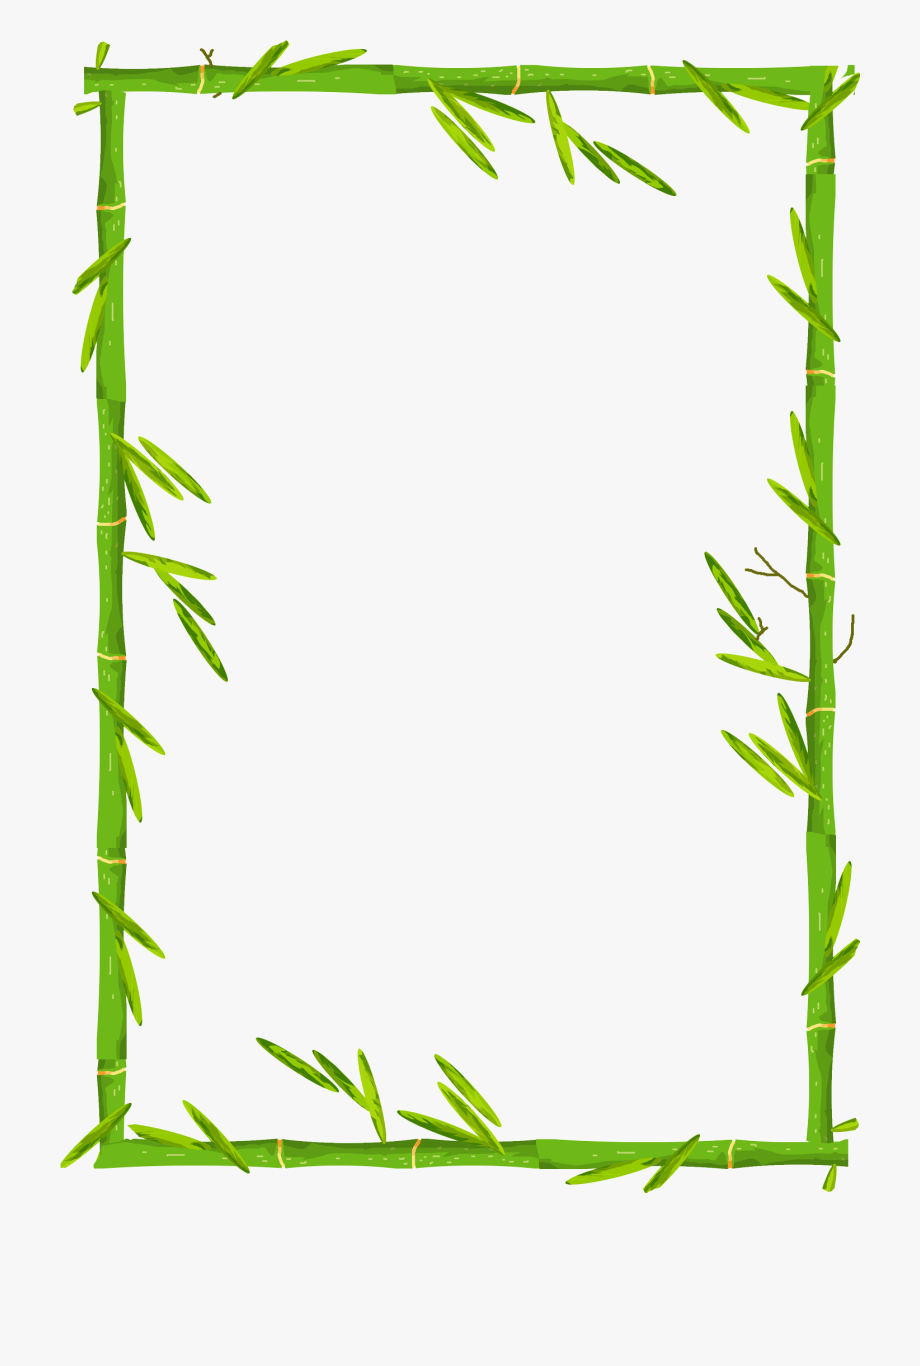 svg free Bamboo transparent border. Download free image green